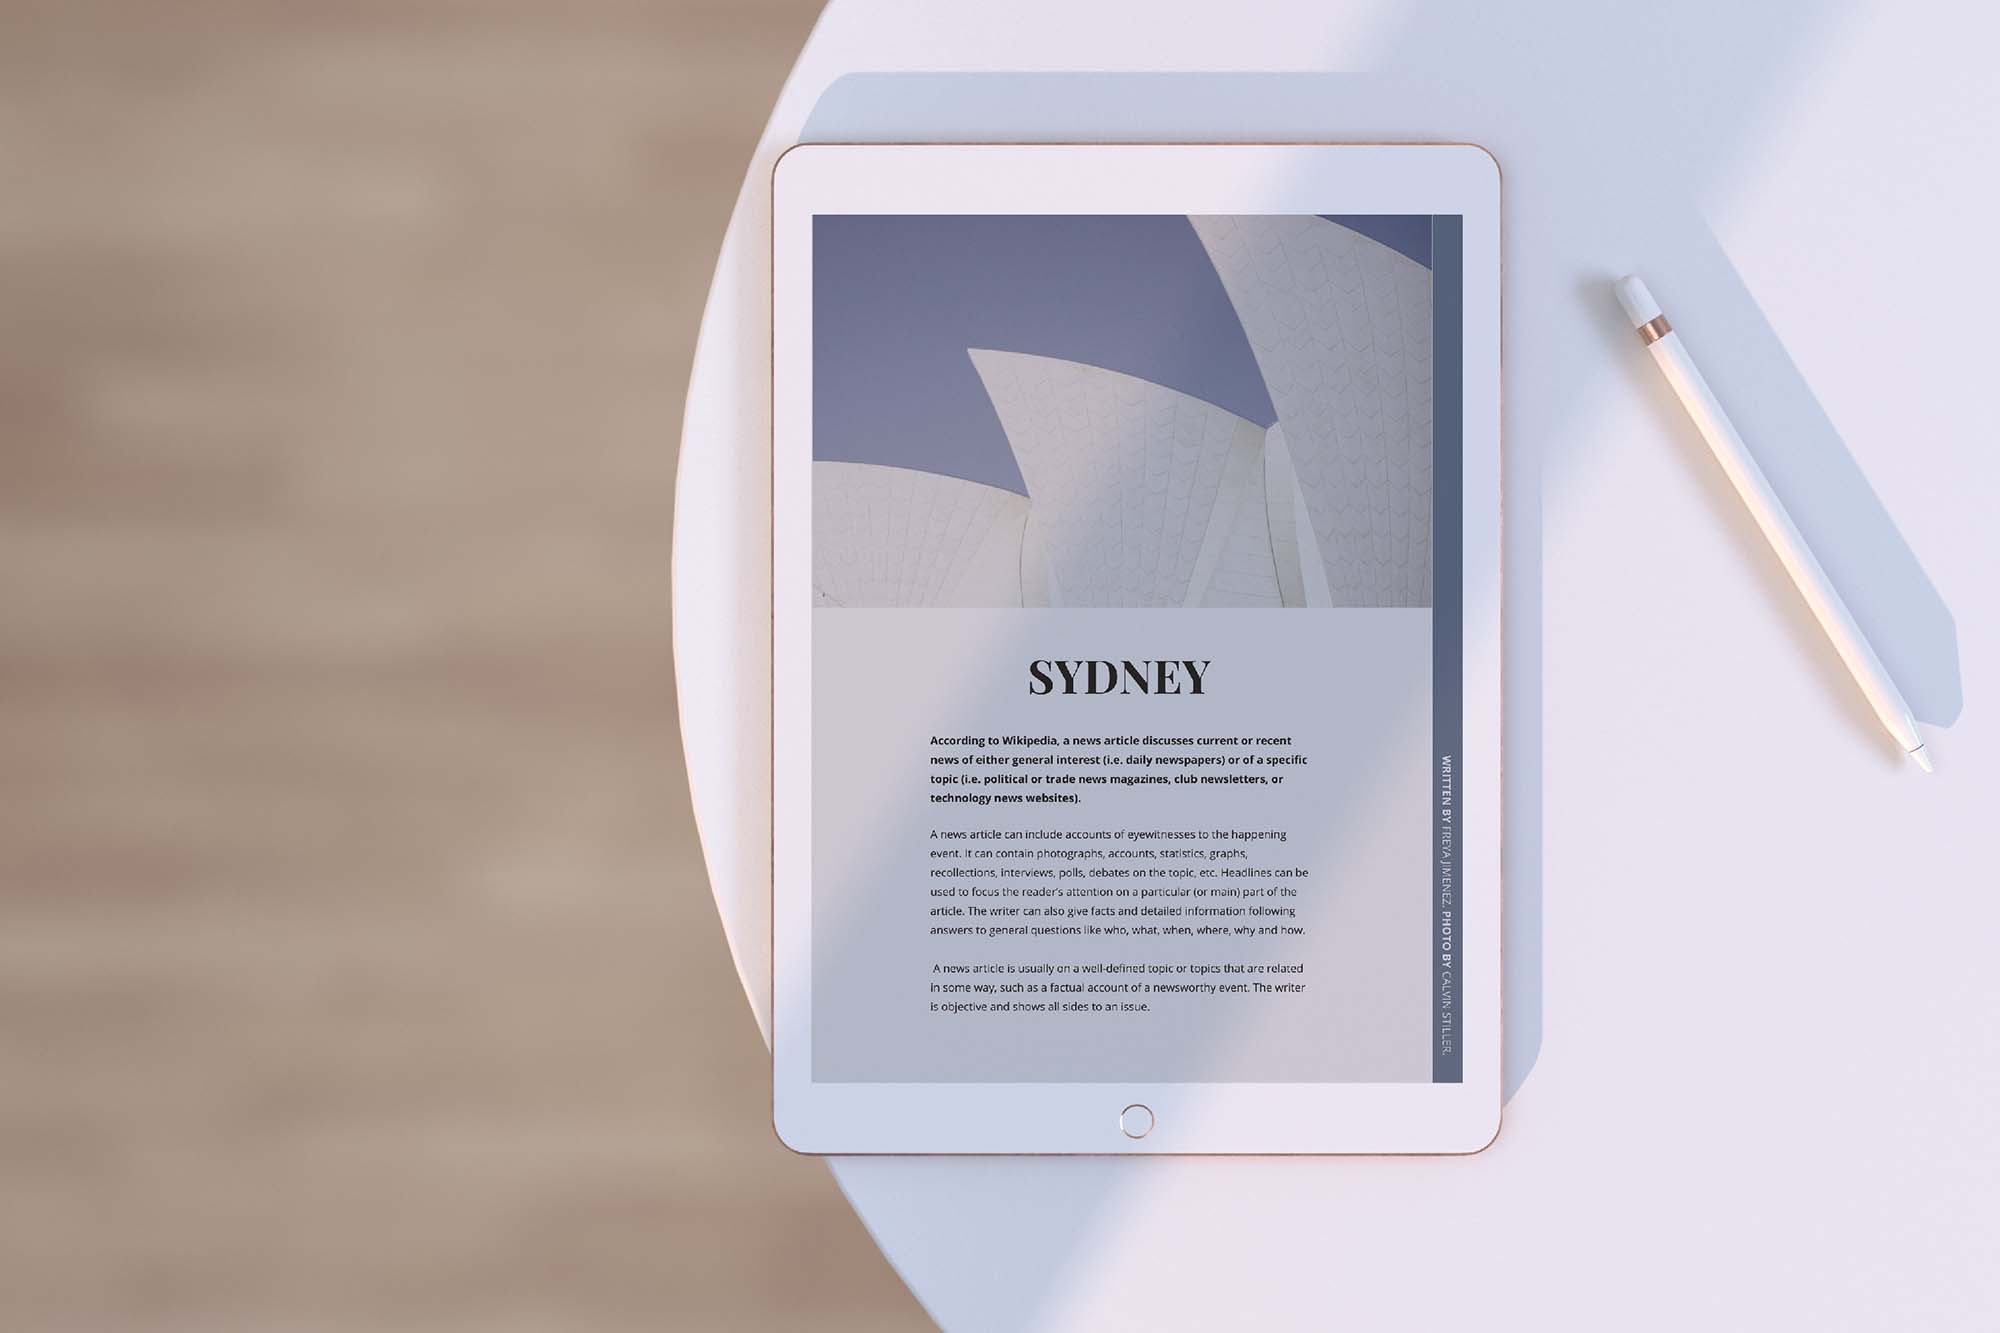 iPad Tablet Mockup